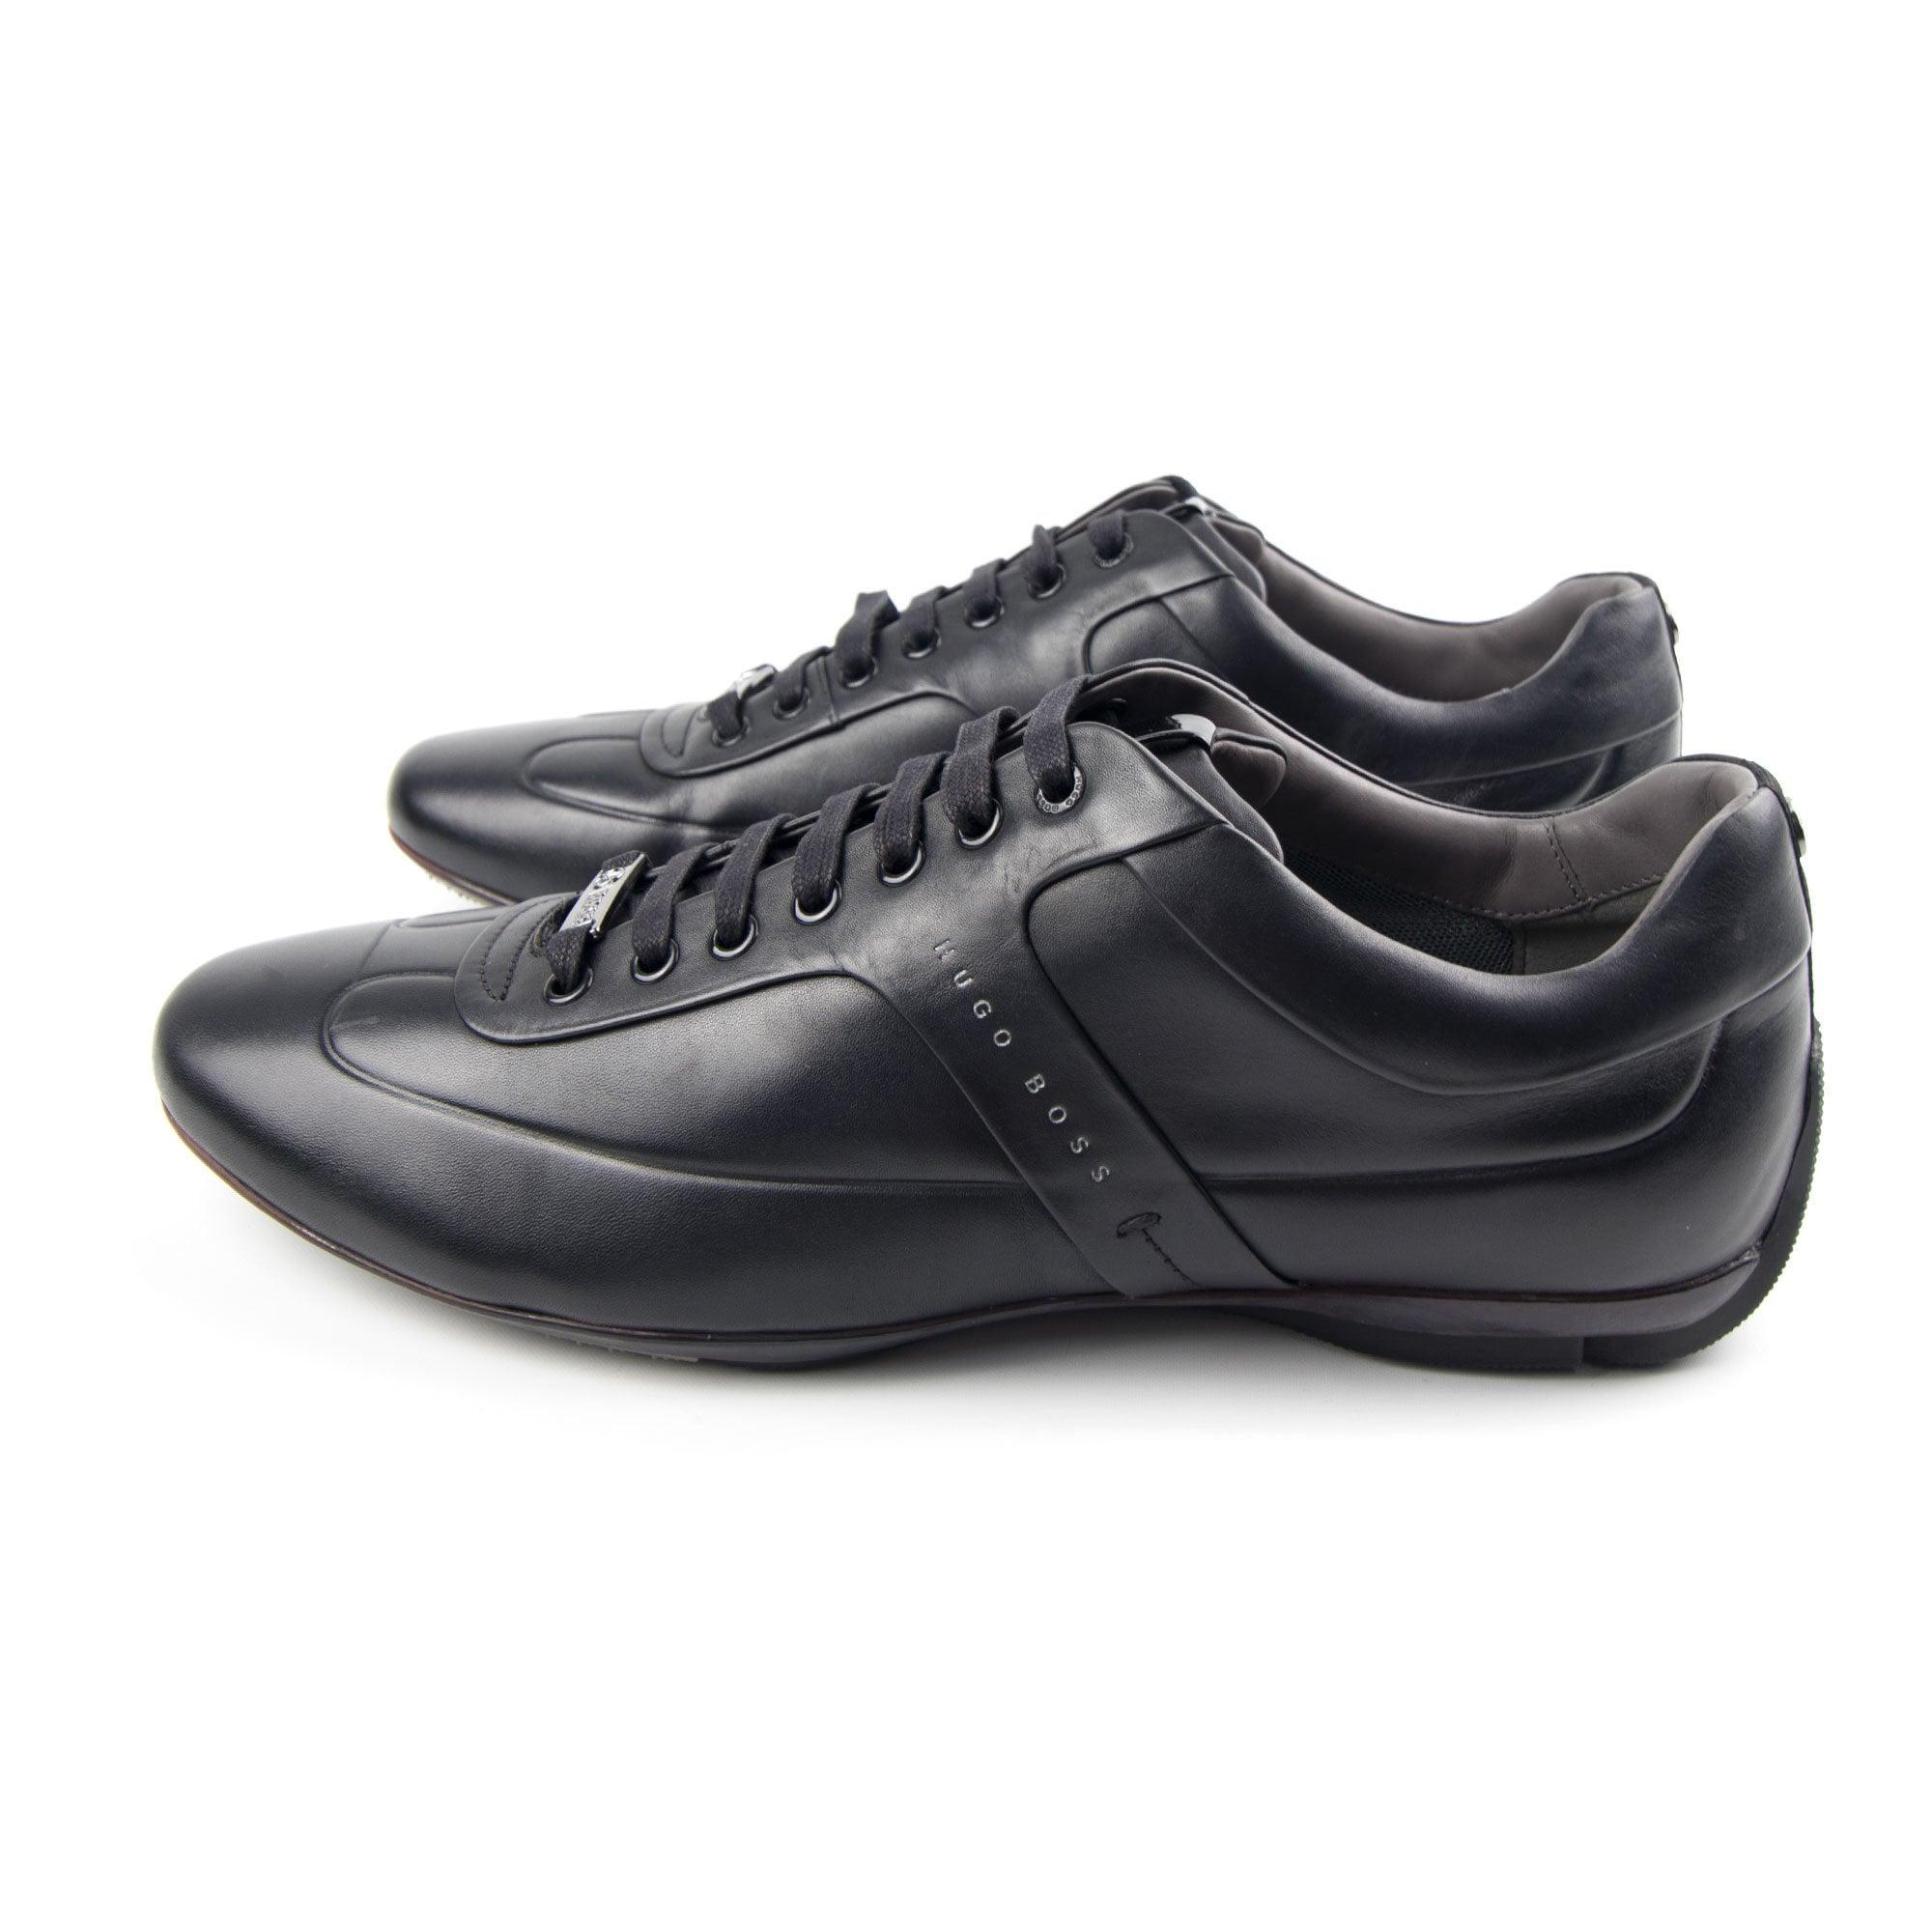 hugo boss trainers black friday